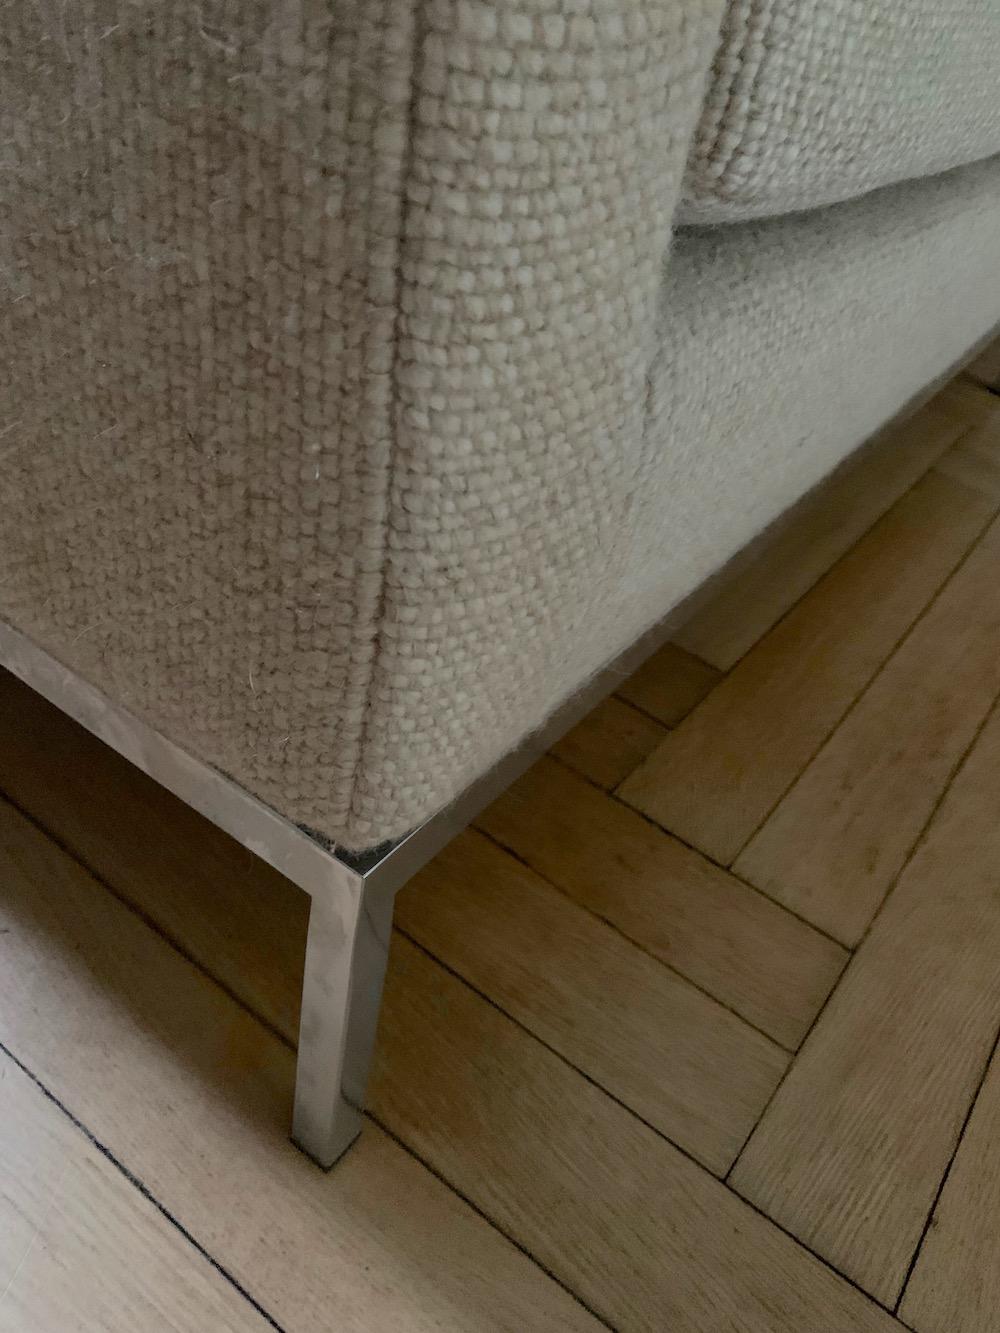 Florence Knoll, vintage sofa, 3 seater, sofa for three, 3-seater, wool sofa, Florence Knoll sofa, modern sofa, modernist sofa, living room, design sofa, midcentury sofa, Florence Knoll model 67A, vintage couch, Knoll couch, Knoll sofa